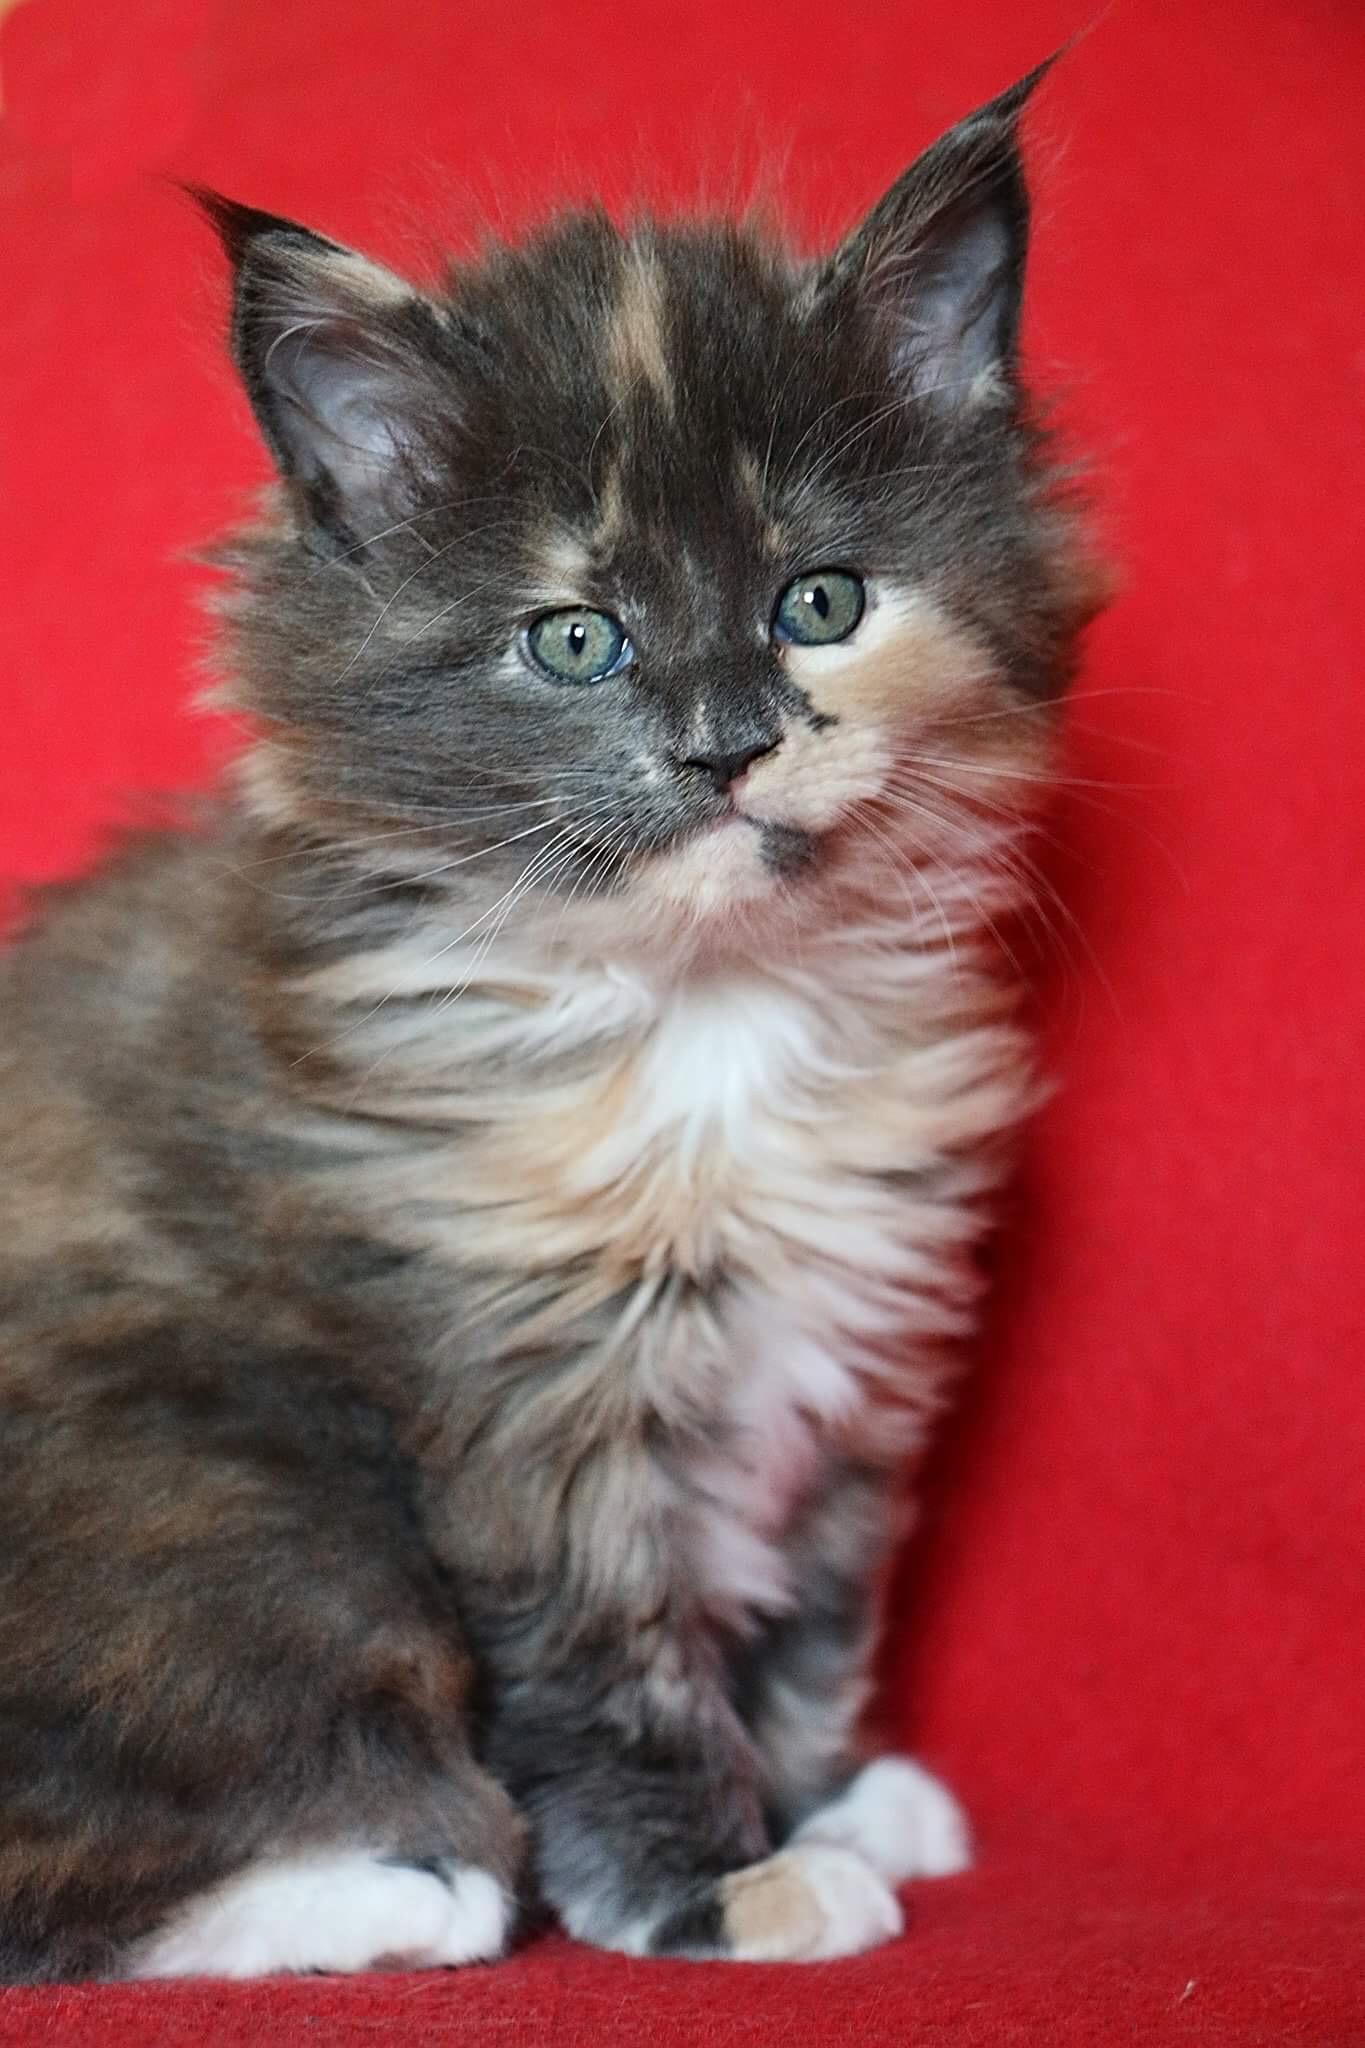 fotka kočky Vrh D: Digi Nikk von Erillian, CZ